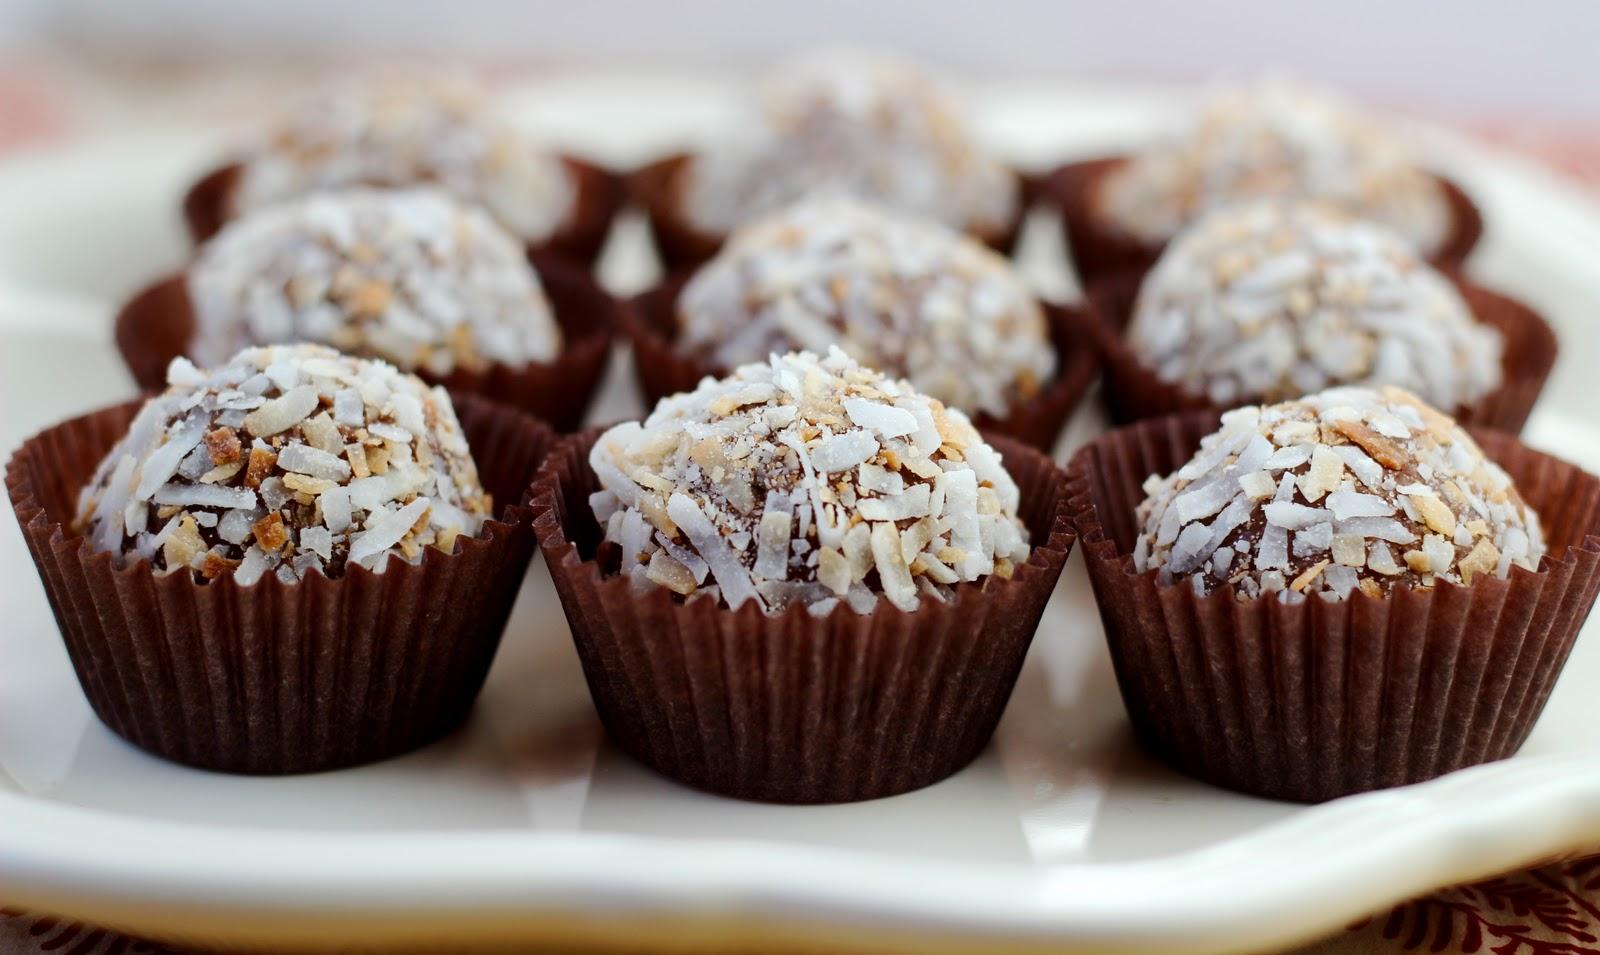 ... wife {fifo life: bake it: Chocolate Coconut Truffles} | the fifo wife